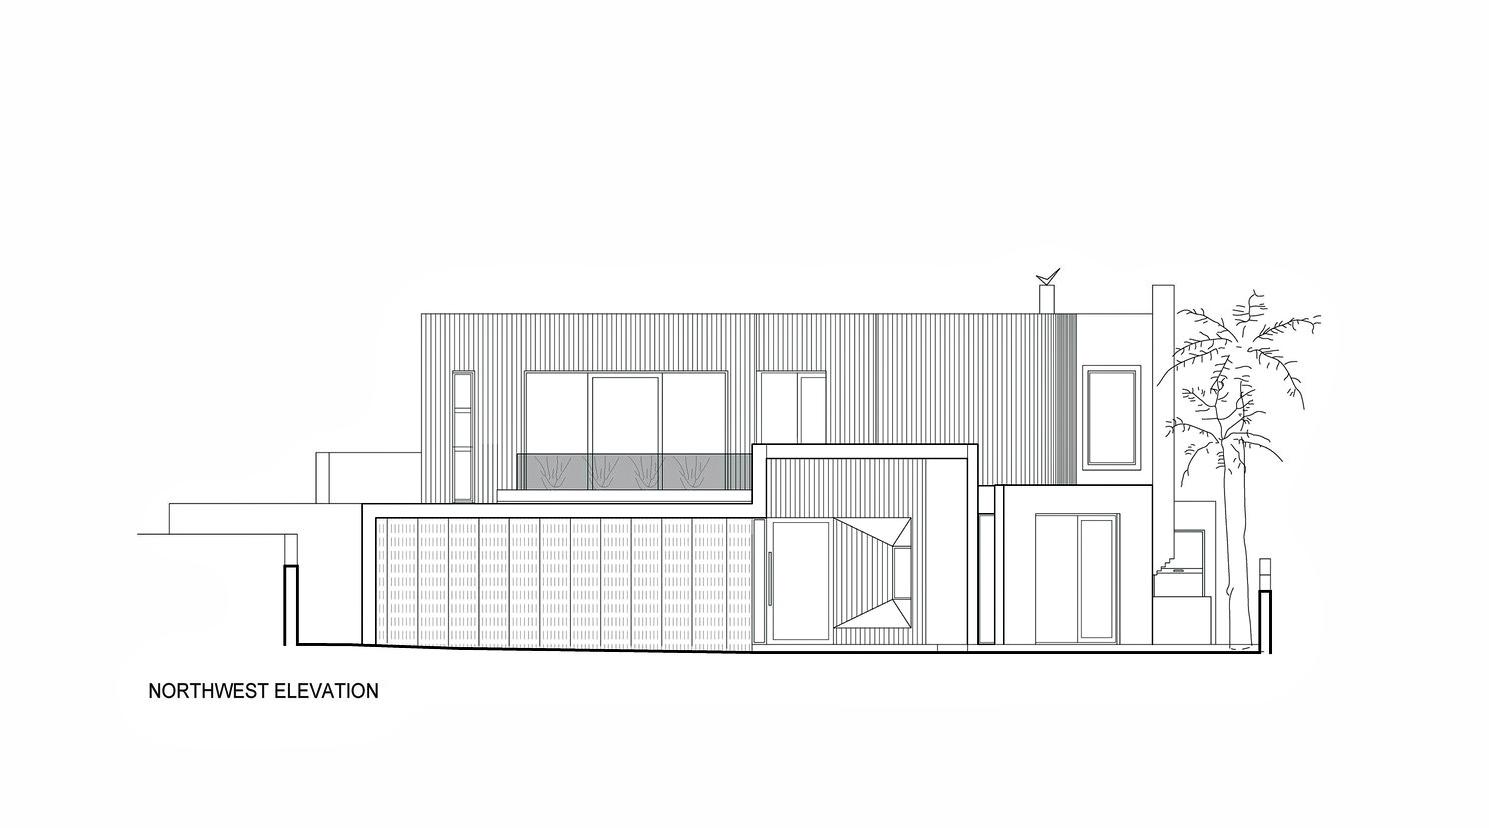 Northwest Elevation – Dalkeith Luxury Residence – 135 Circe Cir, Dalkeith, WA, Australia